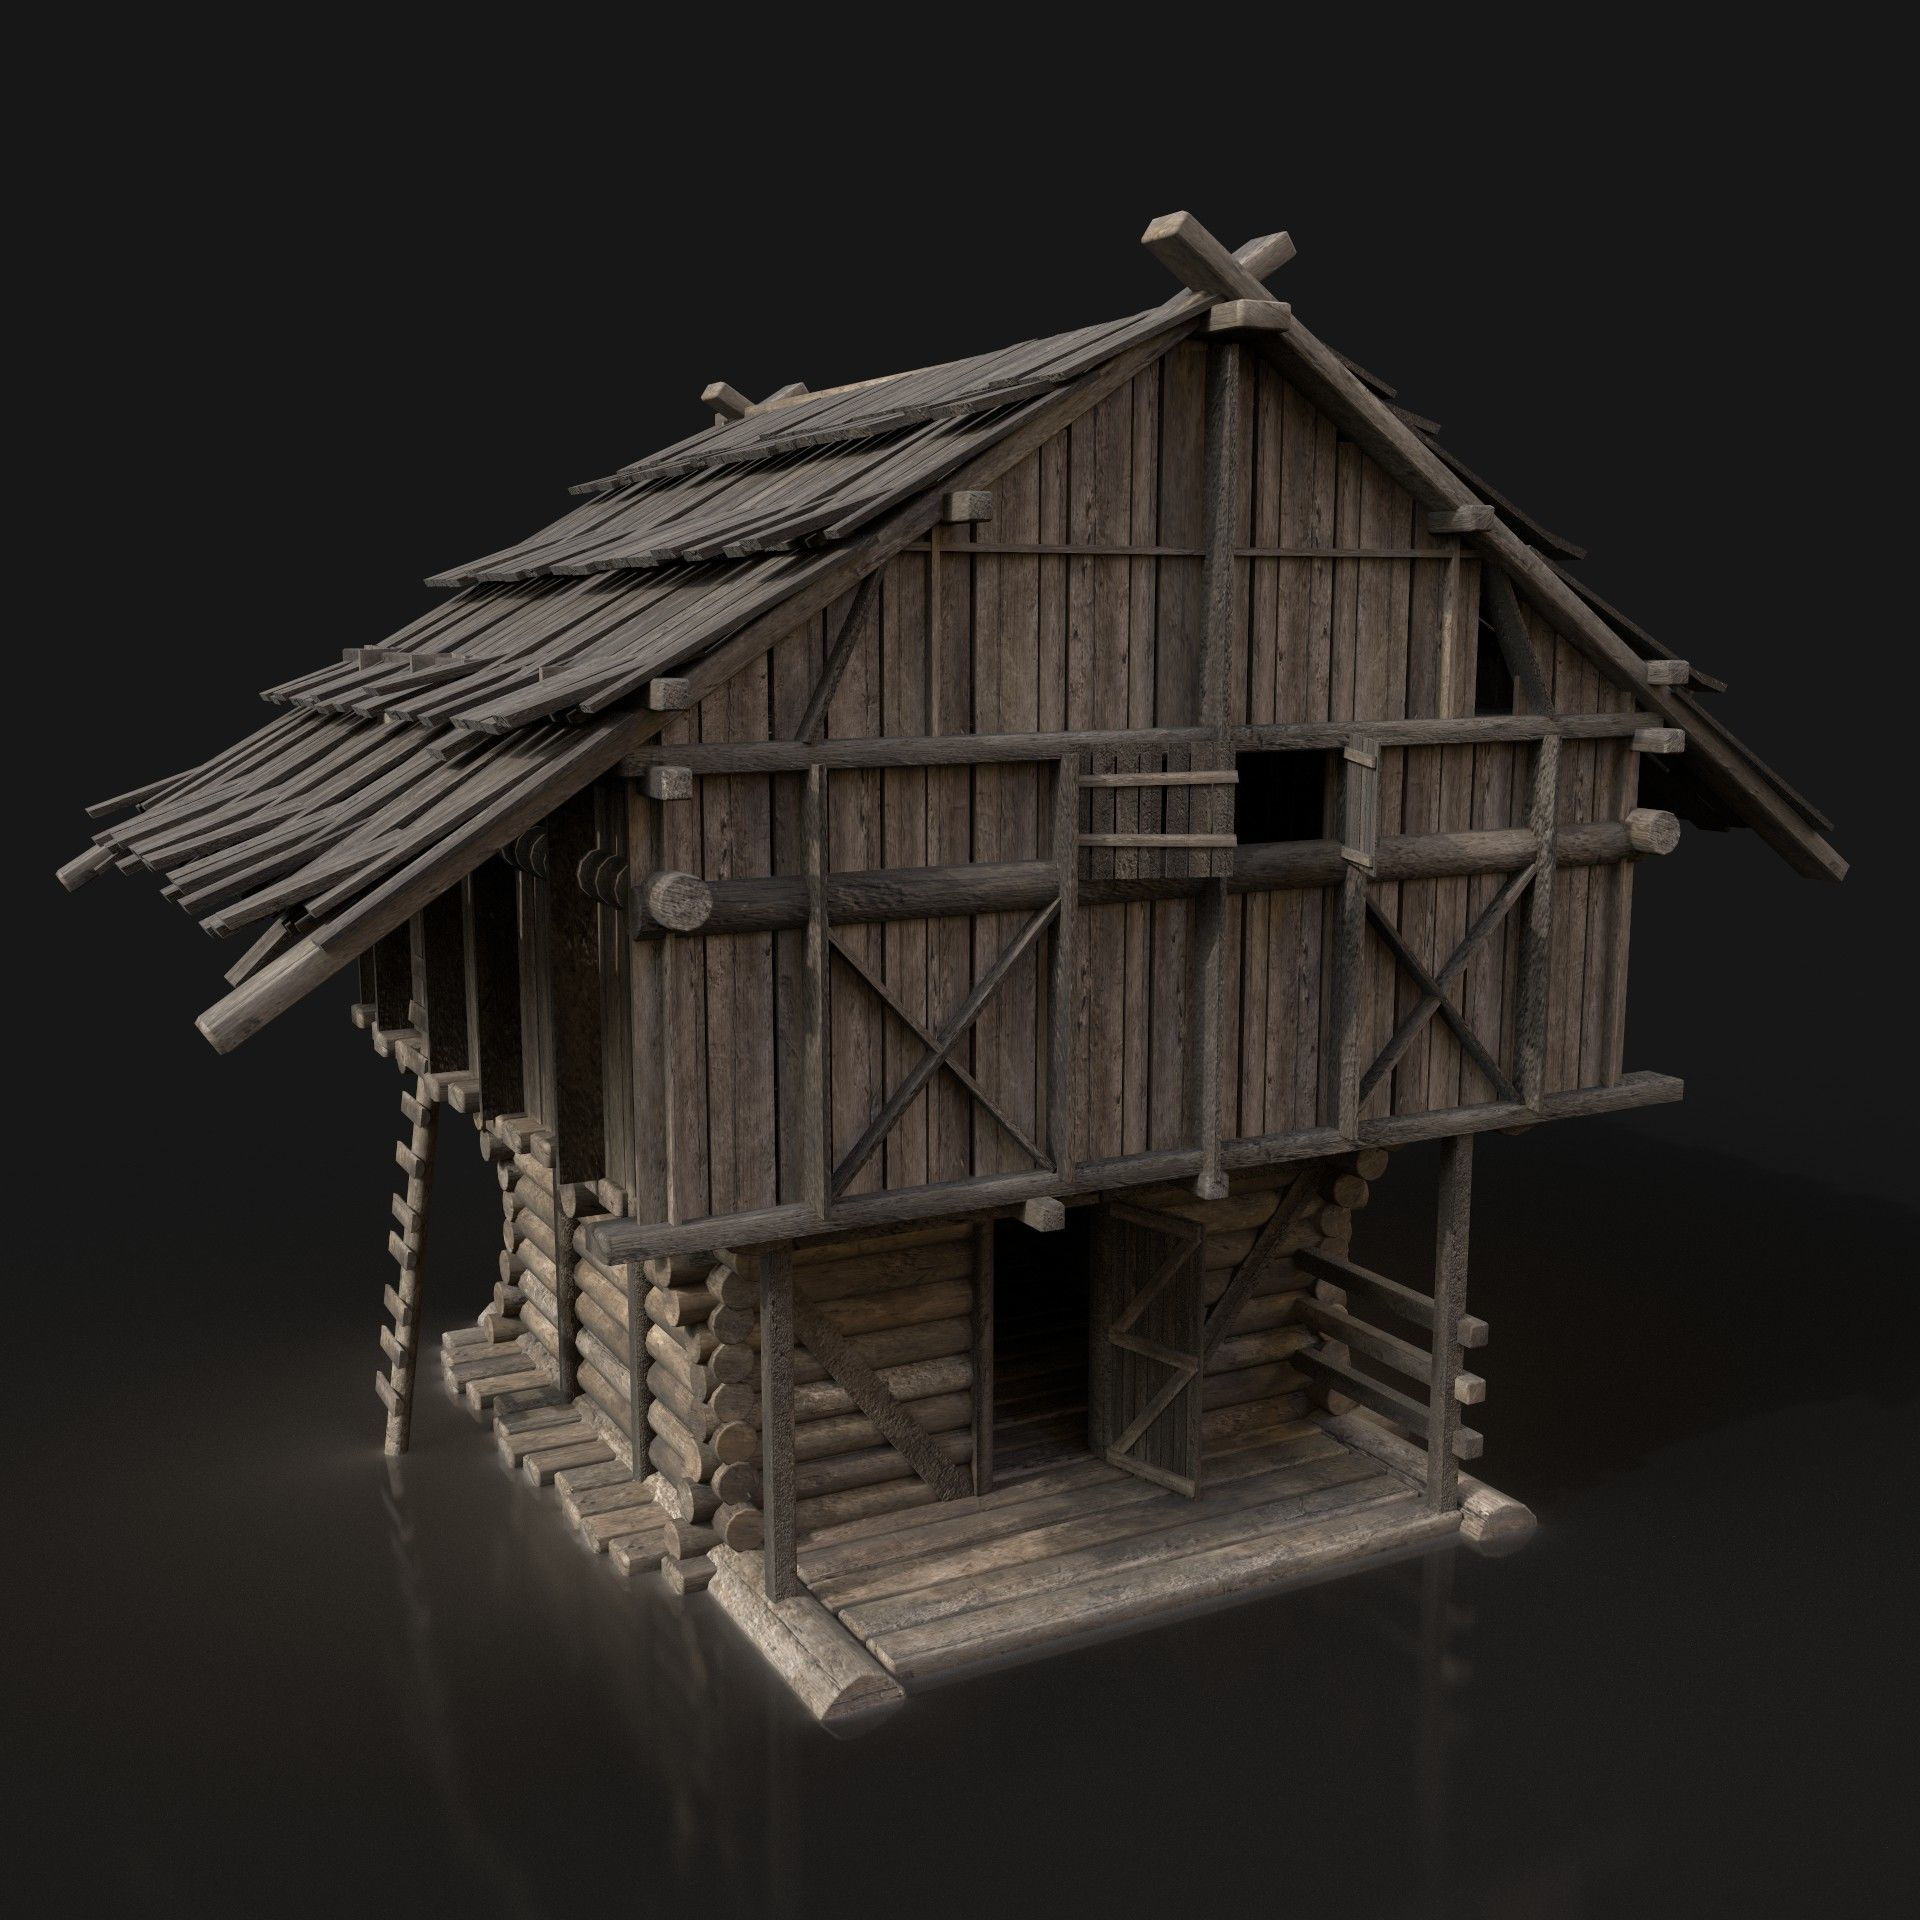 Viking Big House Cottage Hut Northern Fantasy Next Gen AAA